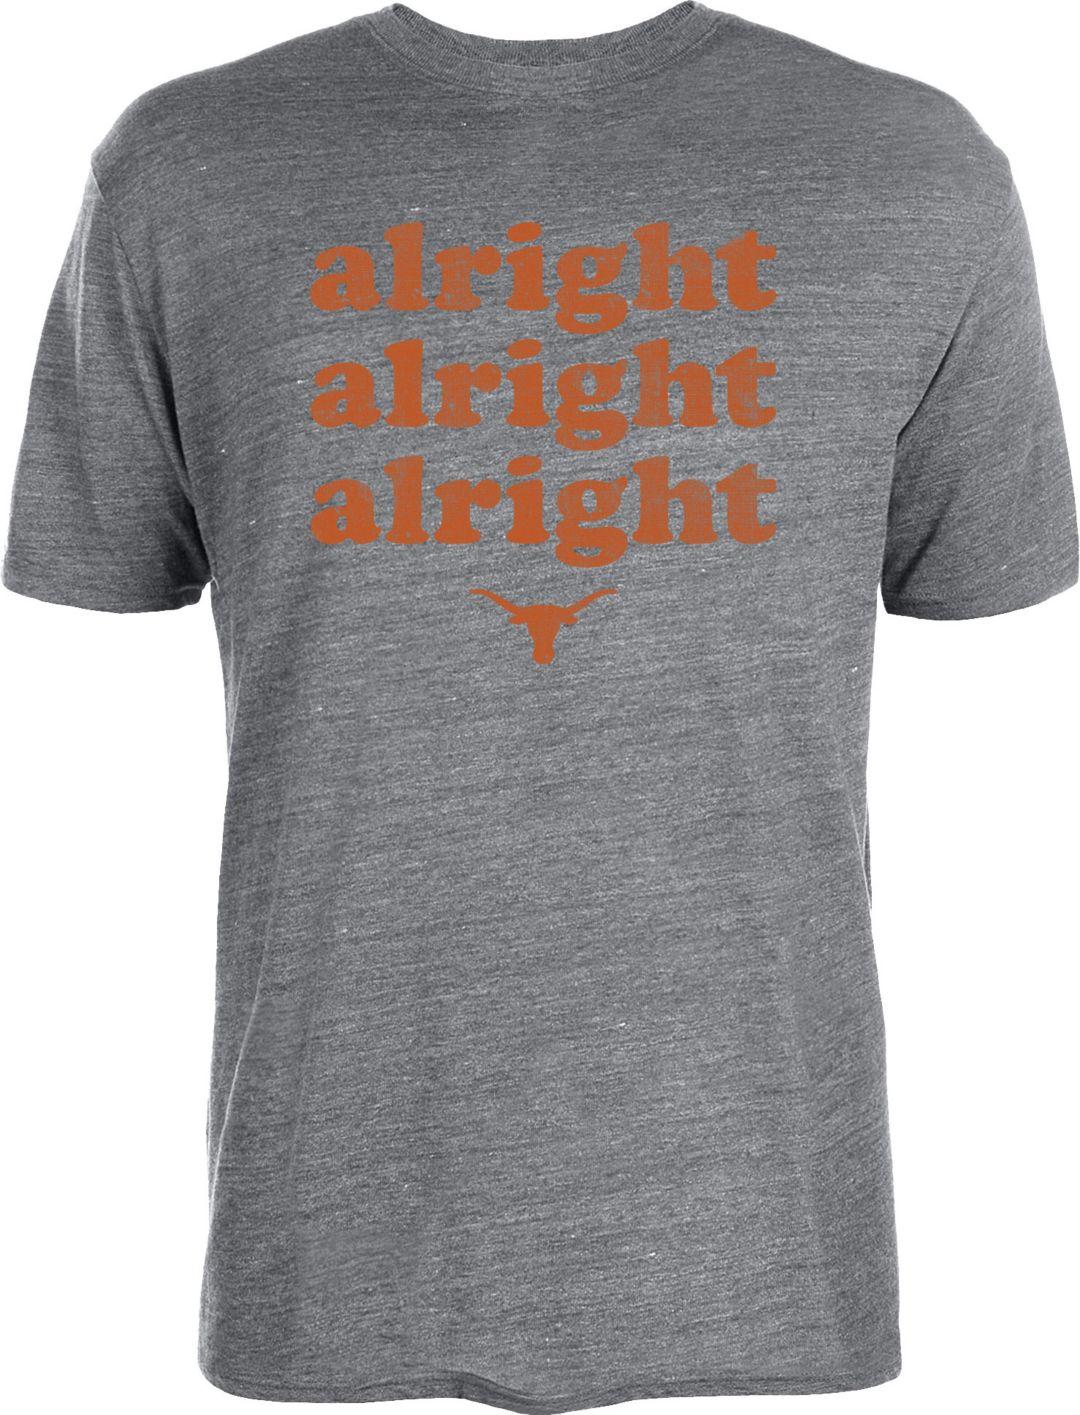 the latest 36cd2 22370 ... Texas Longhorns Grey  Alright Alright Alright  Tri-Blend T-Shirt.  noImageFound. 1